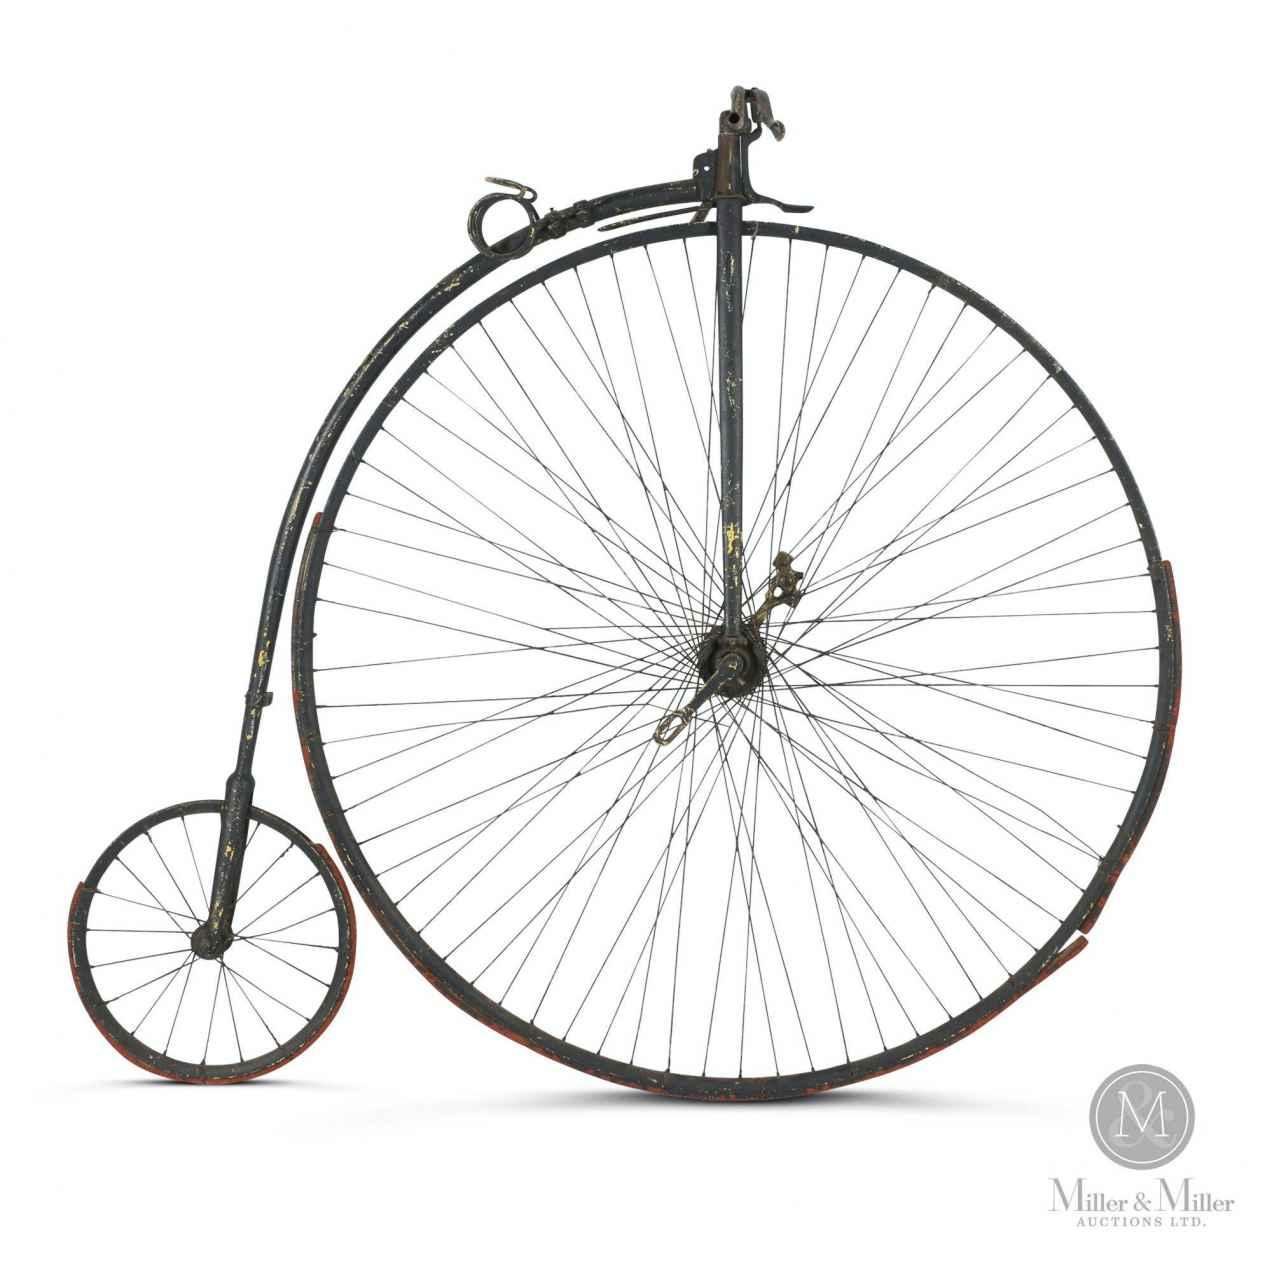 Circa 1890 Goold high-wheel bicycle made in Canada